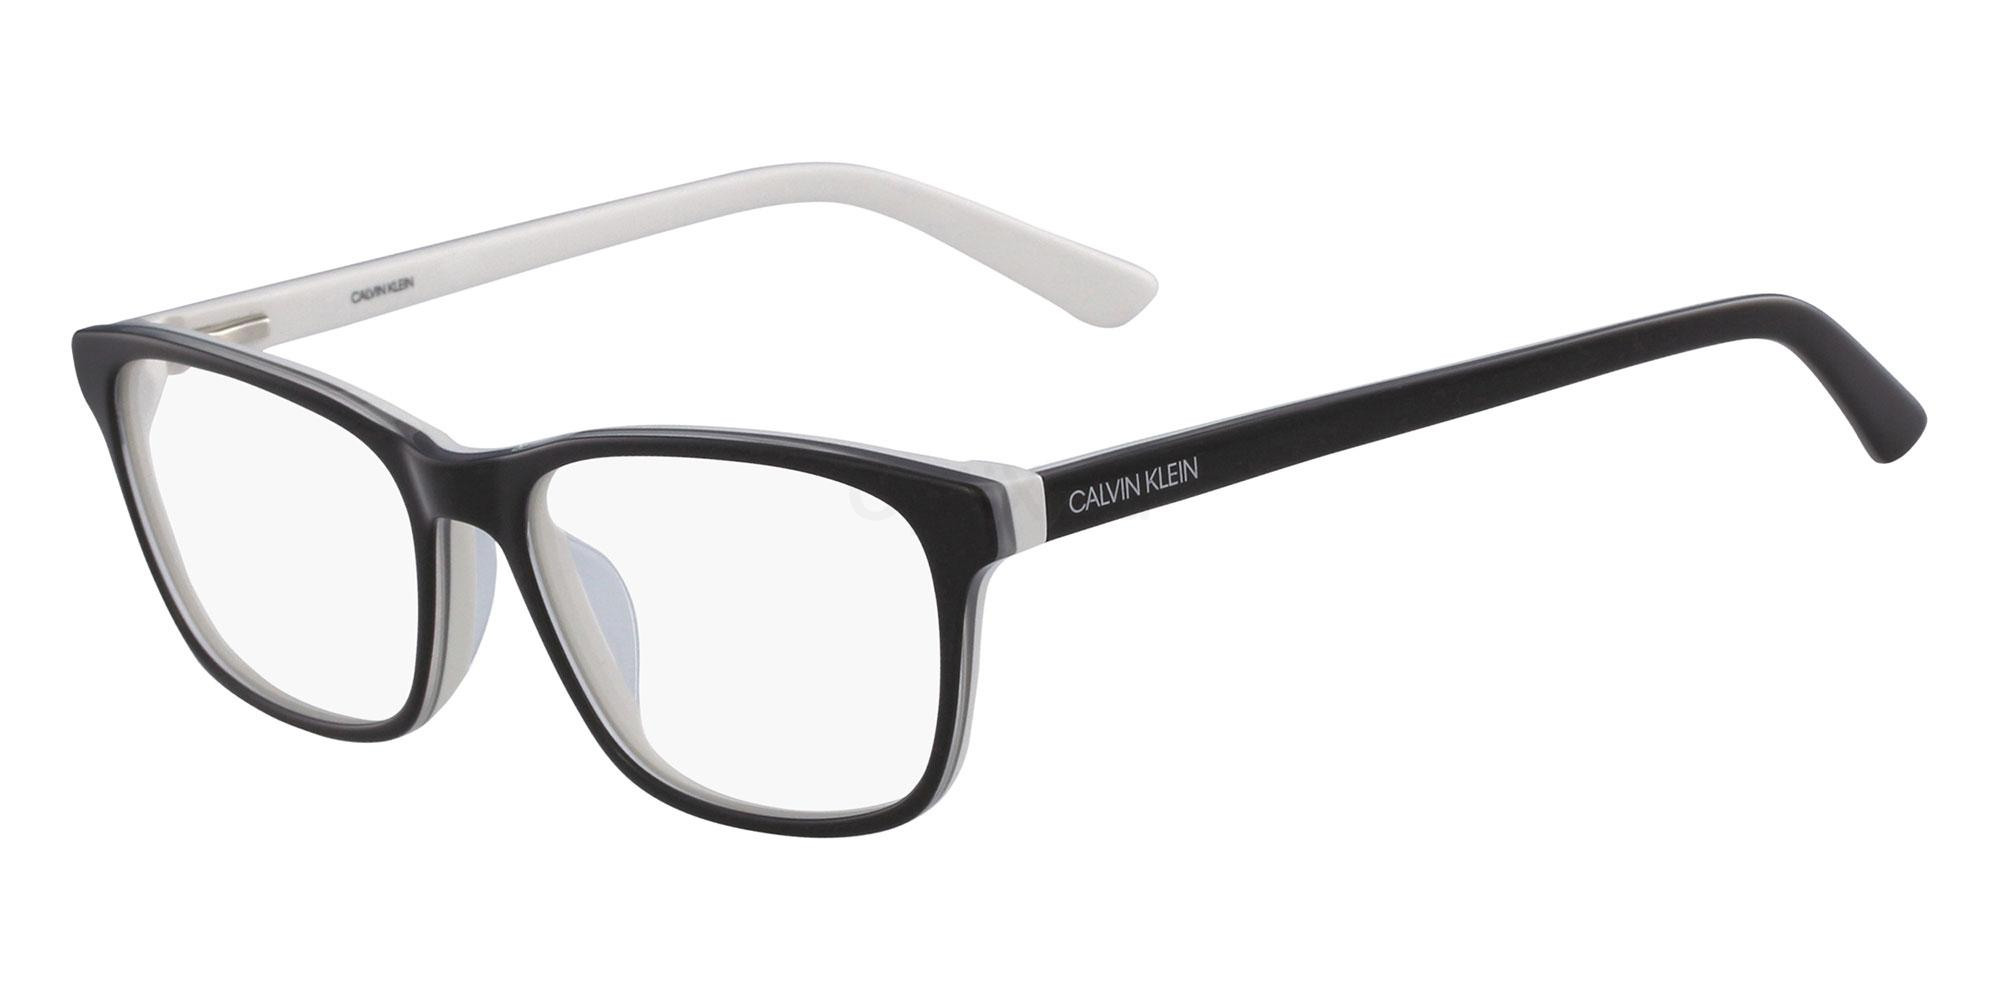 002 CK18515 Glasses, Calvin Klein